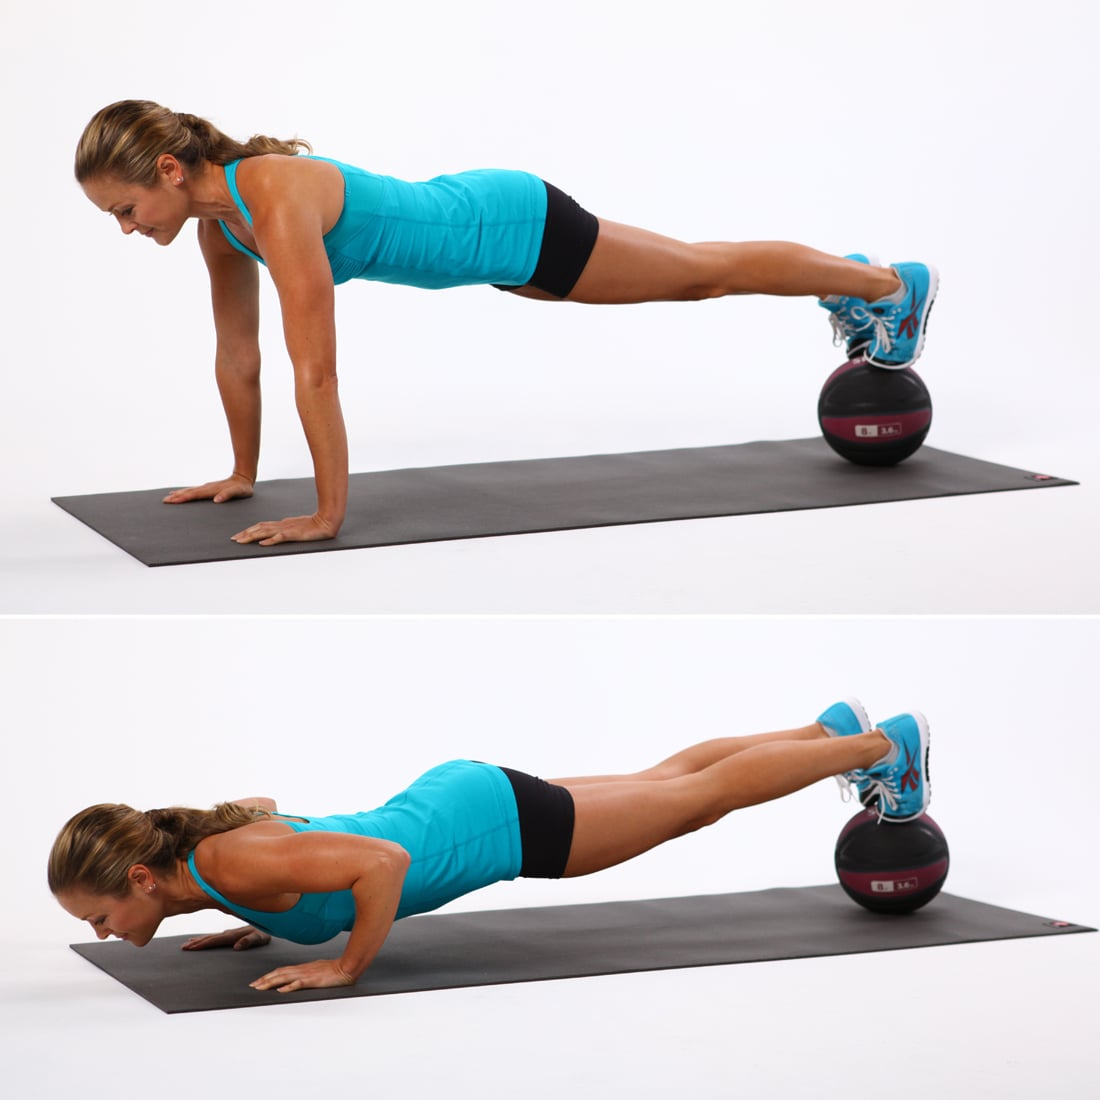 Feet-on-Medicine-Ball Push-Up